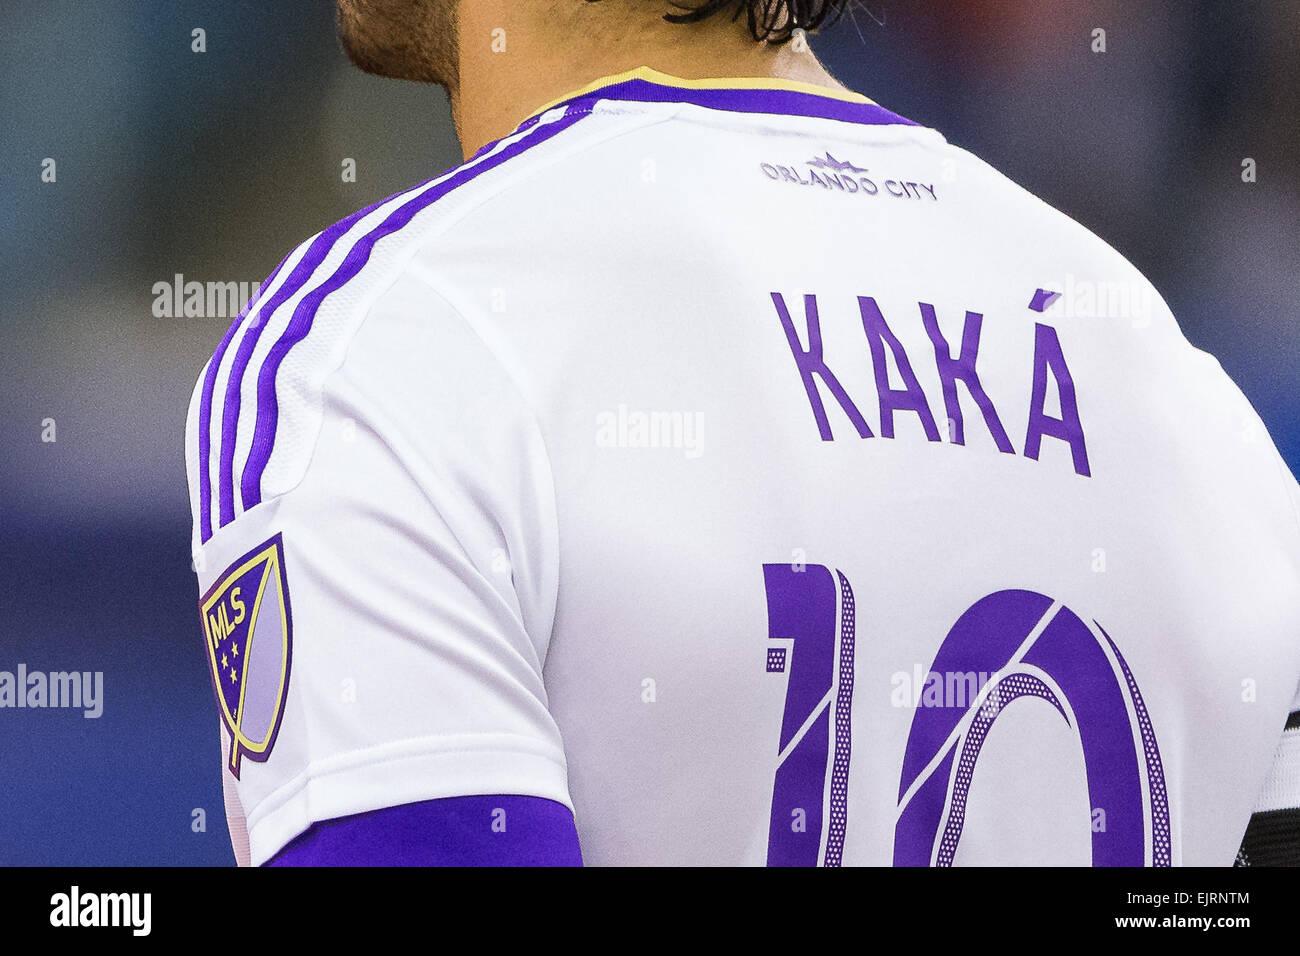 info for c5c6e 3e931 Mar 28, 2015 : A view of Orlando City FC midfielder Kaka's ...